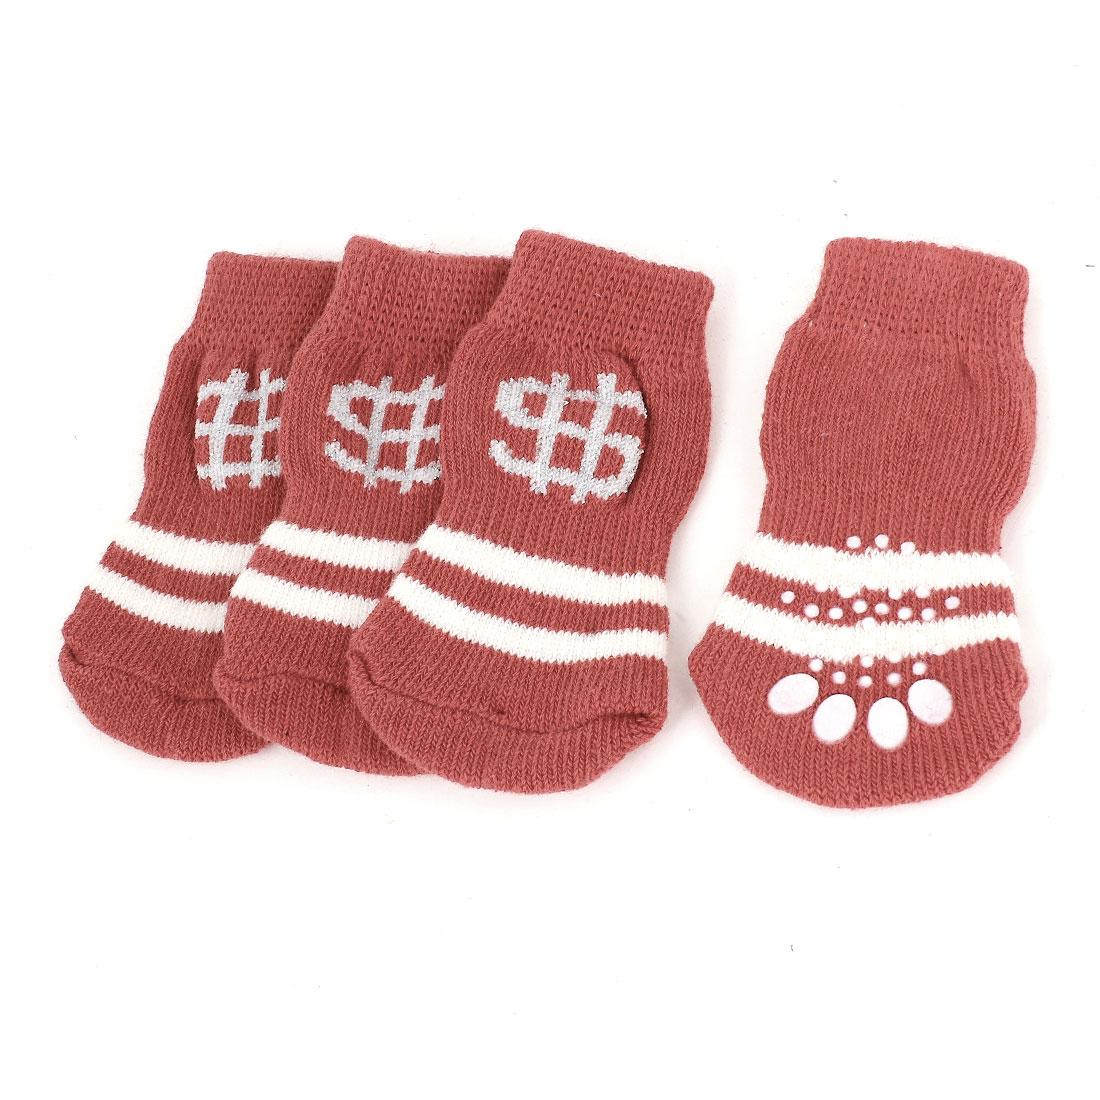 2 Pairs Winter Warm Nonslip Acrylic Pet Dog Puppy Socks Beige Red